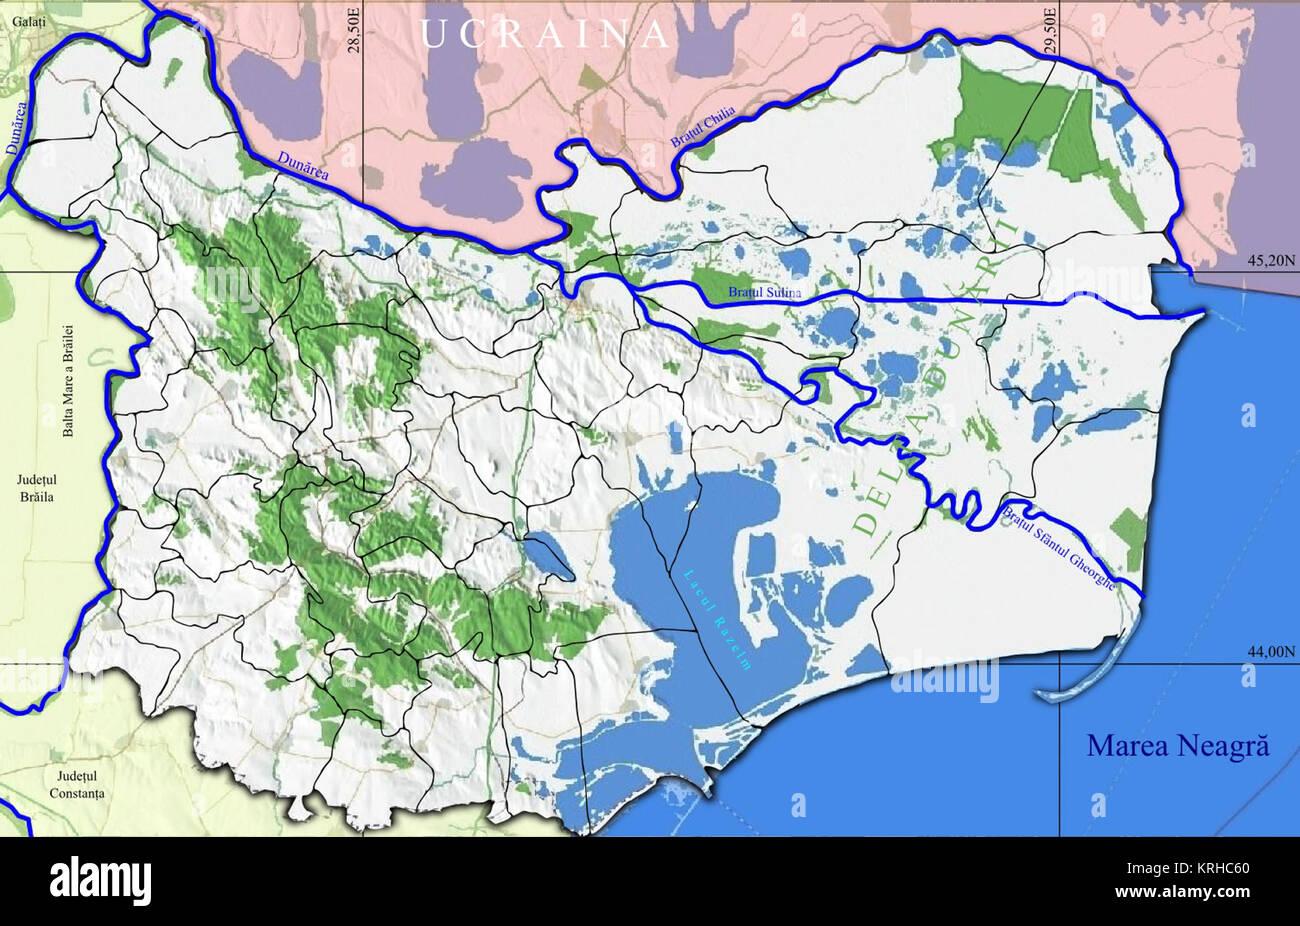 Romania relief Tulcea Location map Stock Photo: 169413160 - Alamy